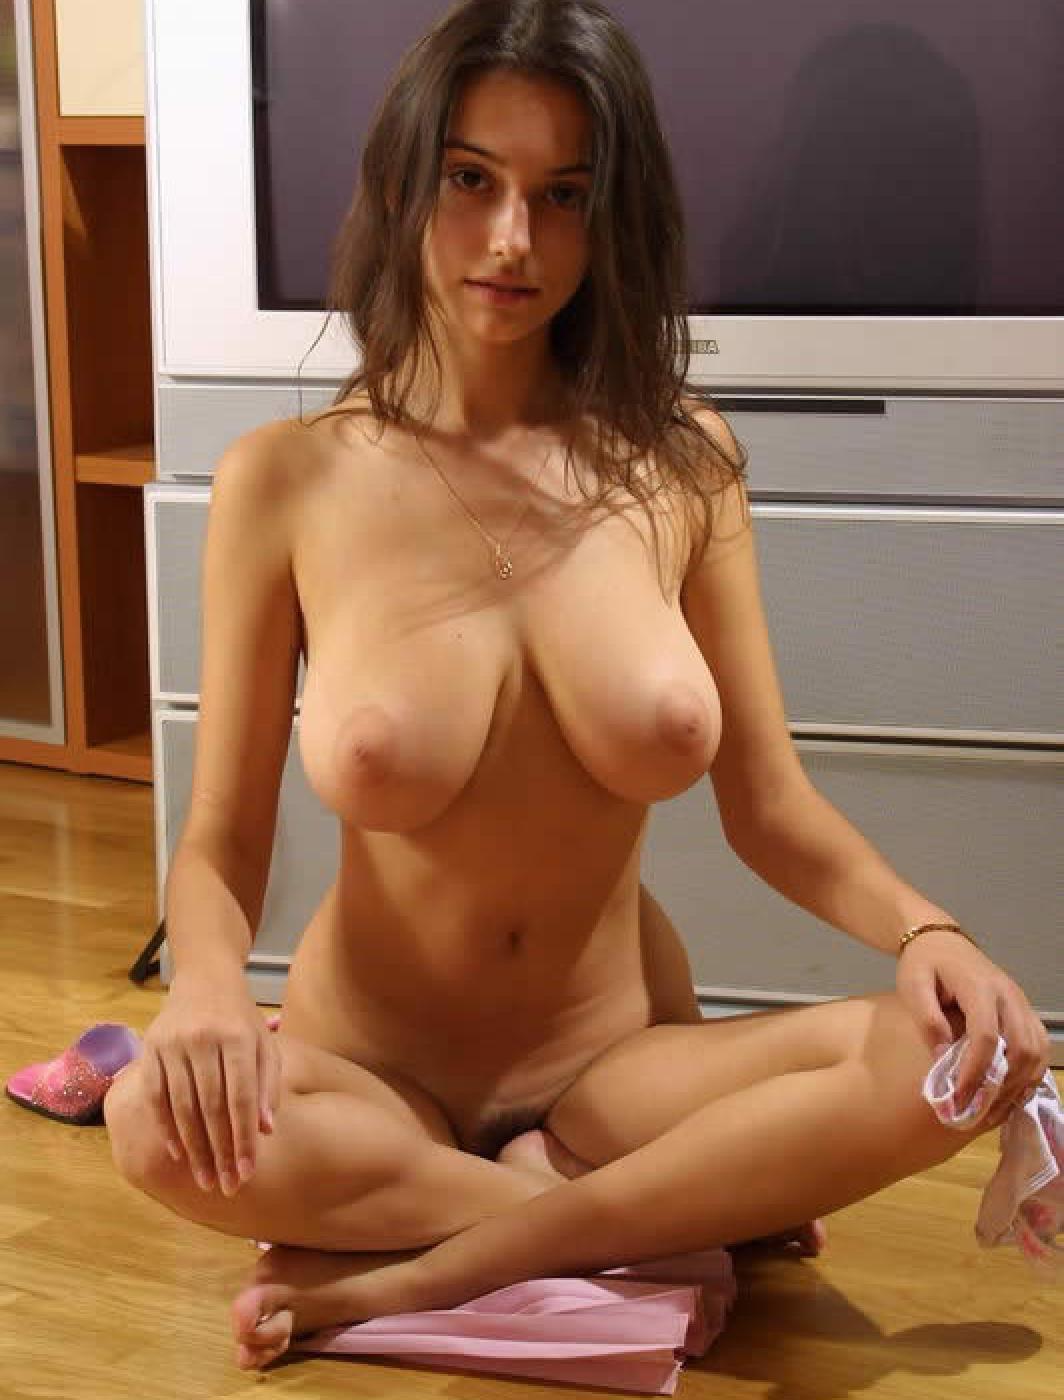 Svetlana Pashchenko - pussy and nipples